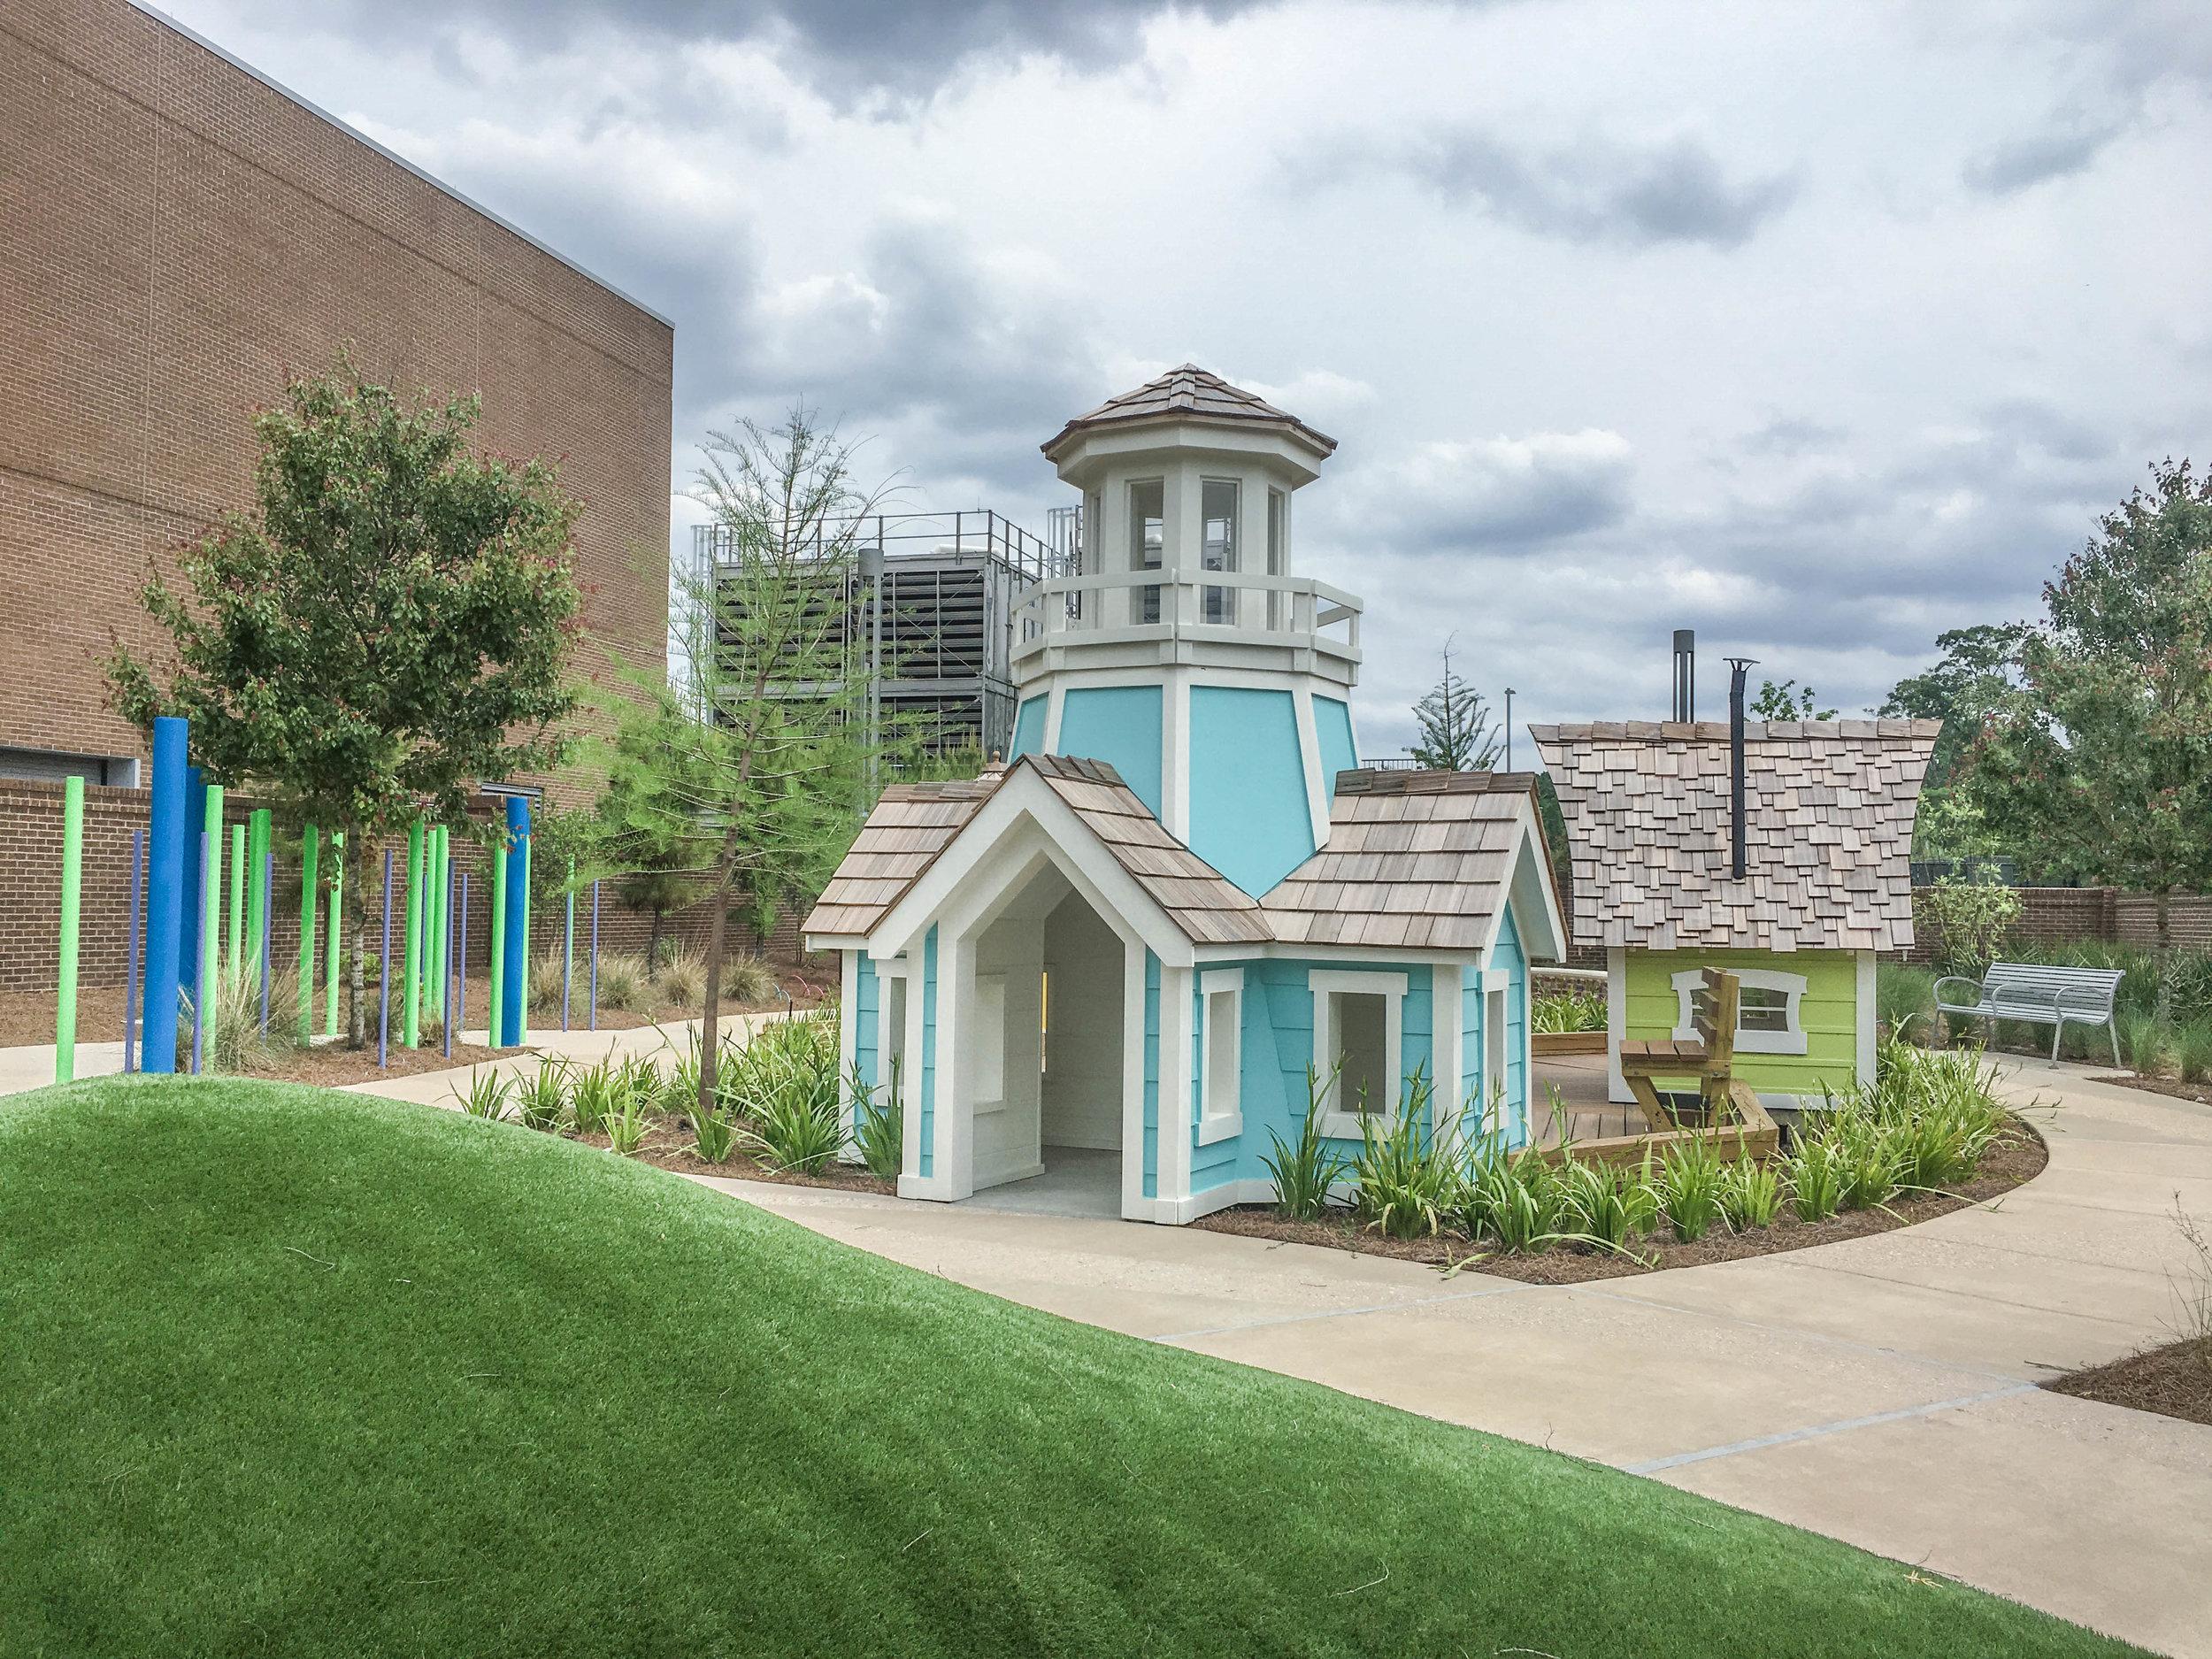 OLOL-Playhouse-Pavilion-17.jpg